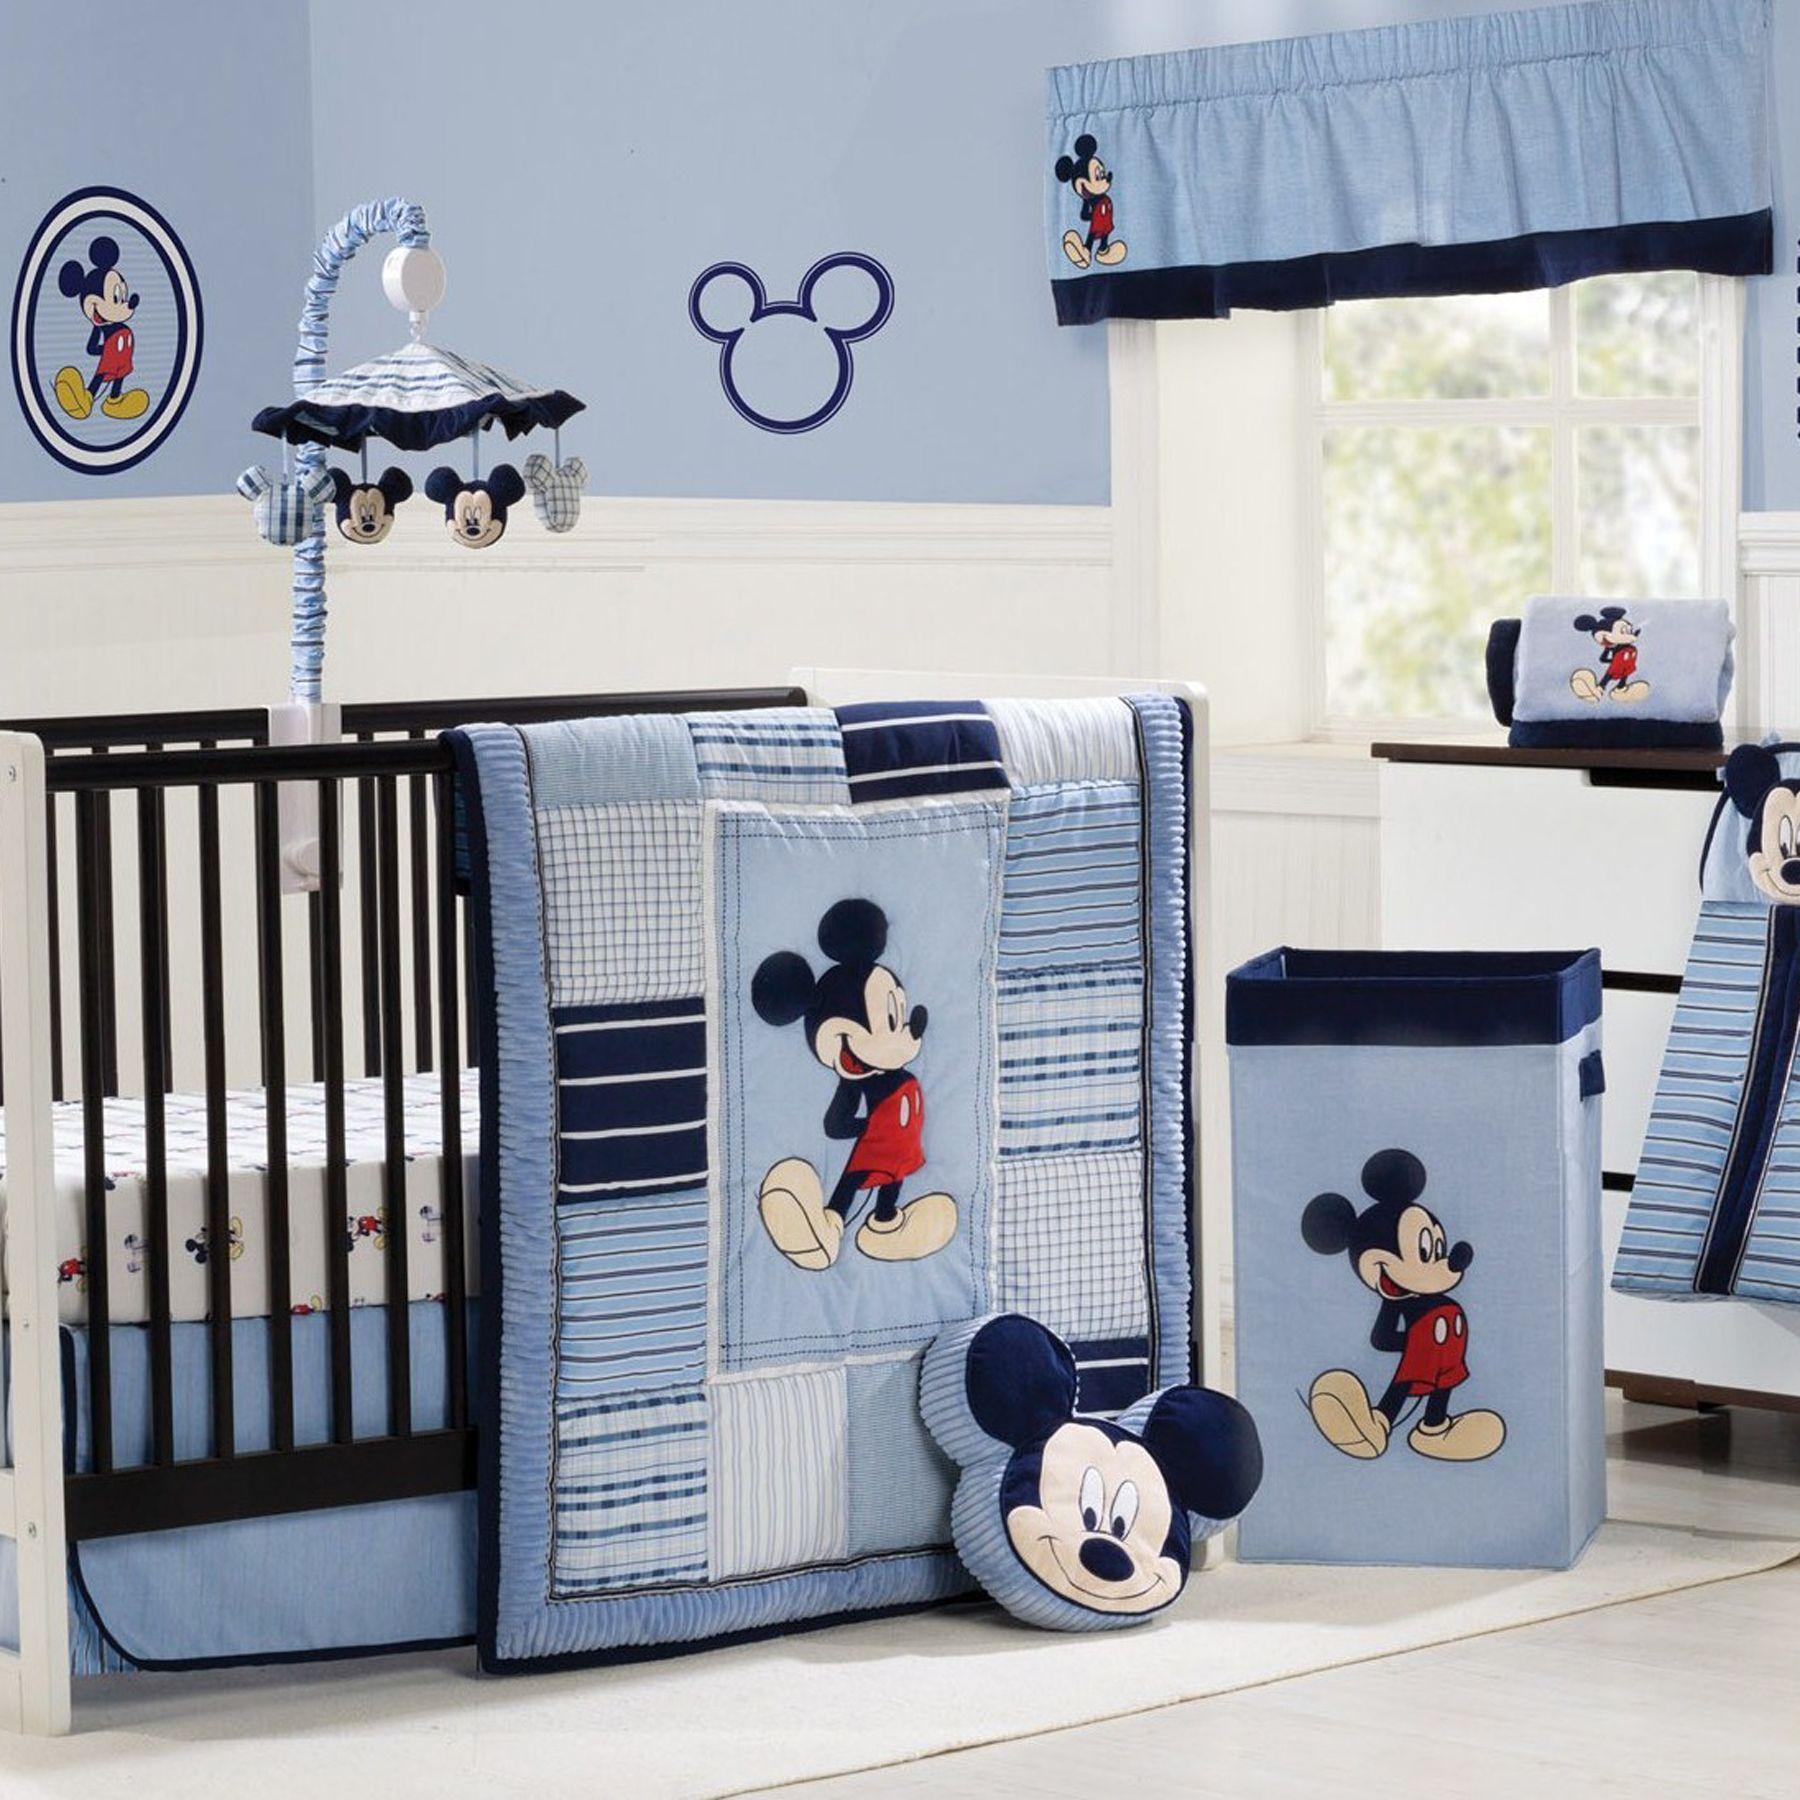 Mickey Mouse Classically Cute 4 Piece Crib Bedding Set Baby Boy Room Nursery Nursery Room Boy Baby Room Design